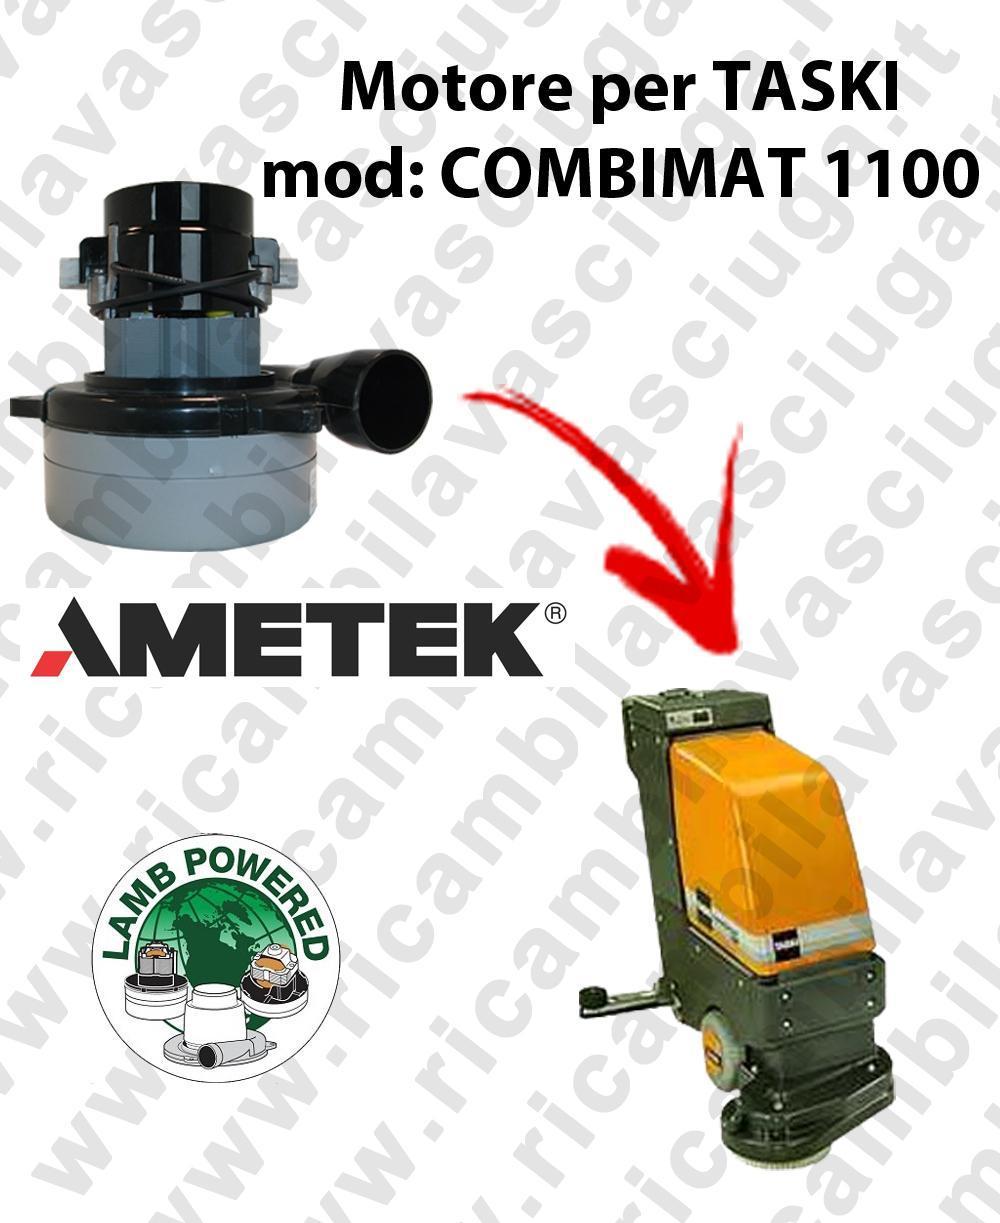 COMBIMAT 1100 Saugmotor LAMB AMETEK für scheuersaugmaschinen TASKI